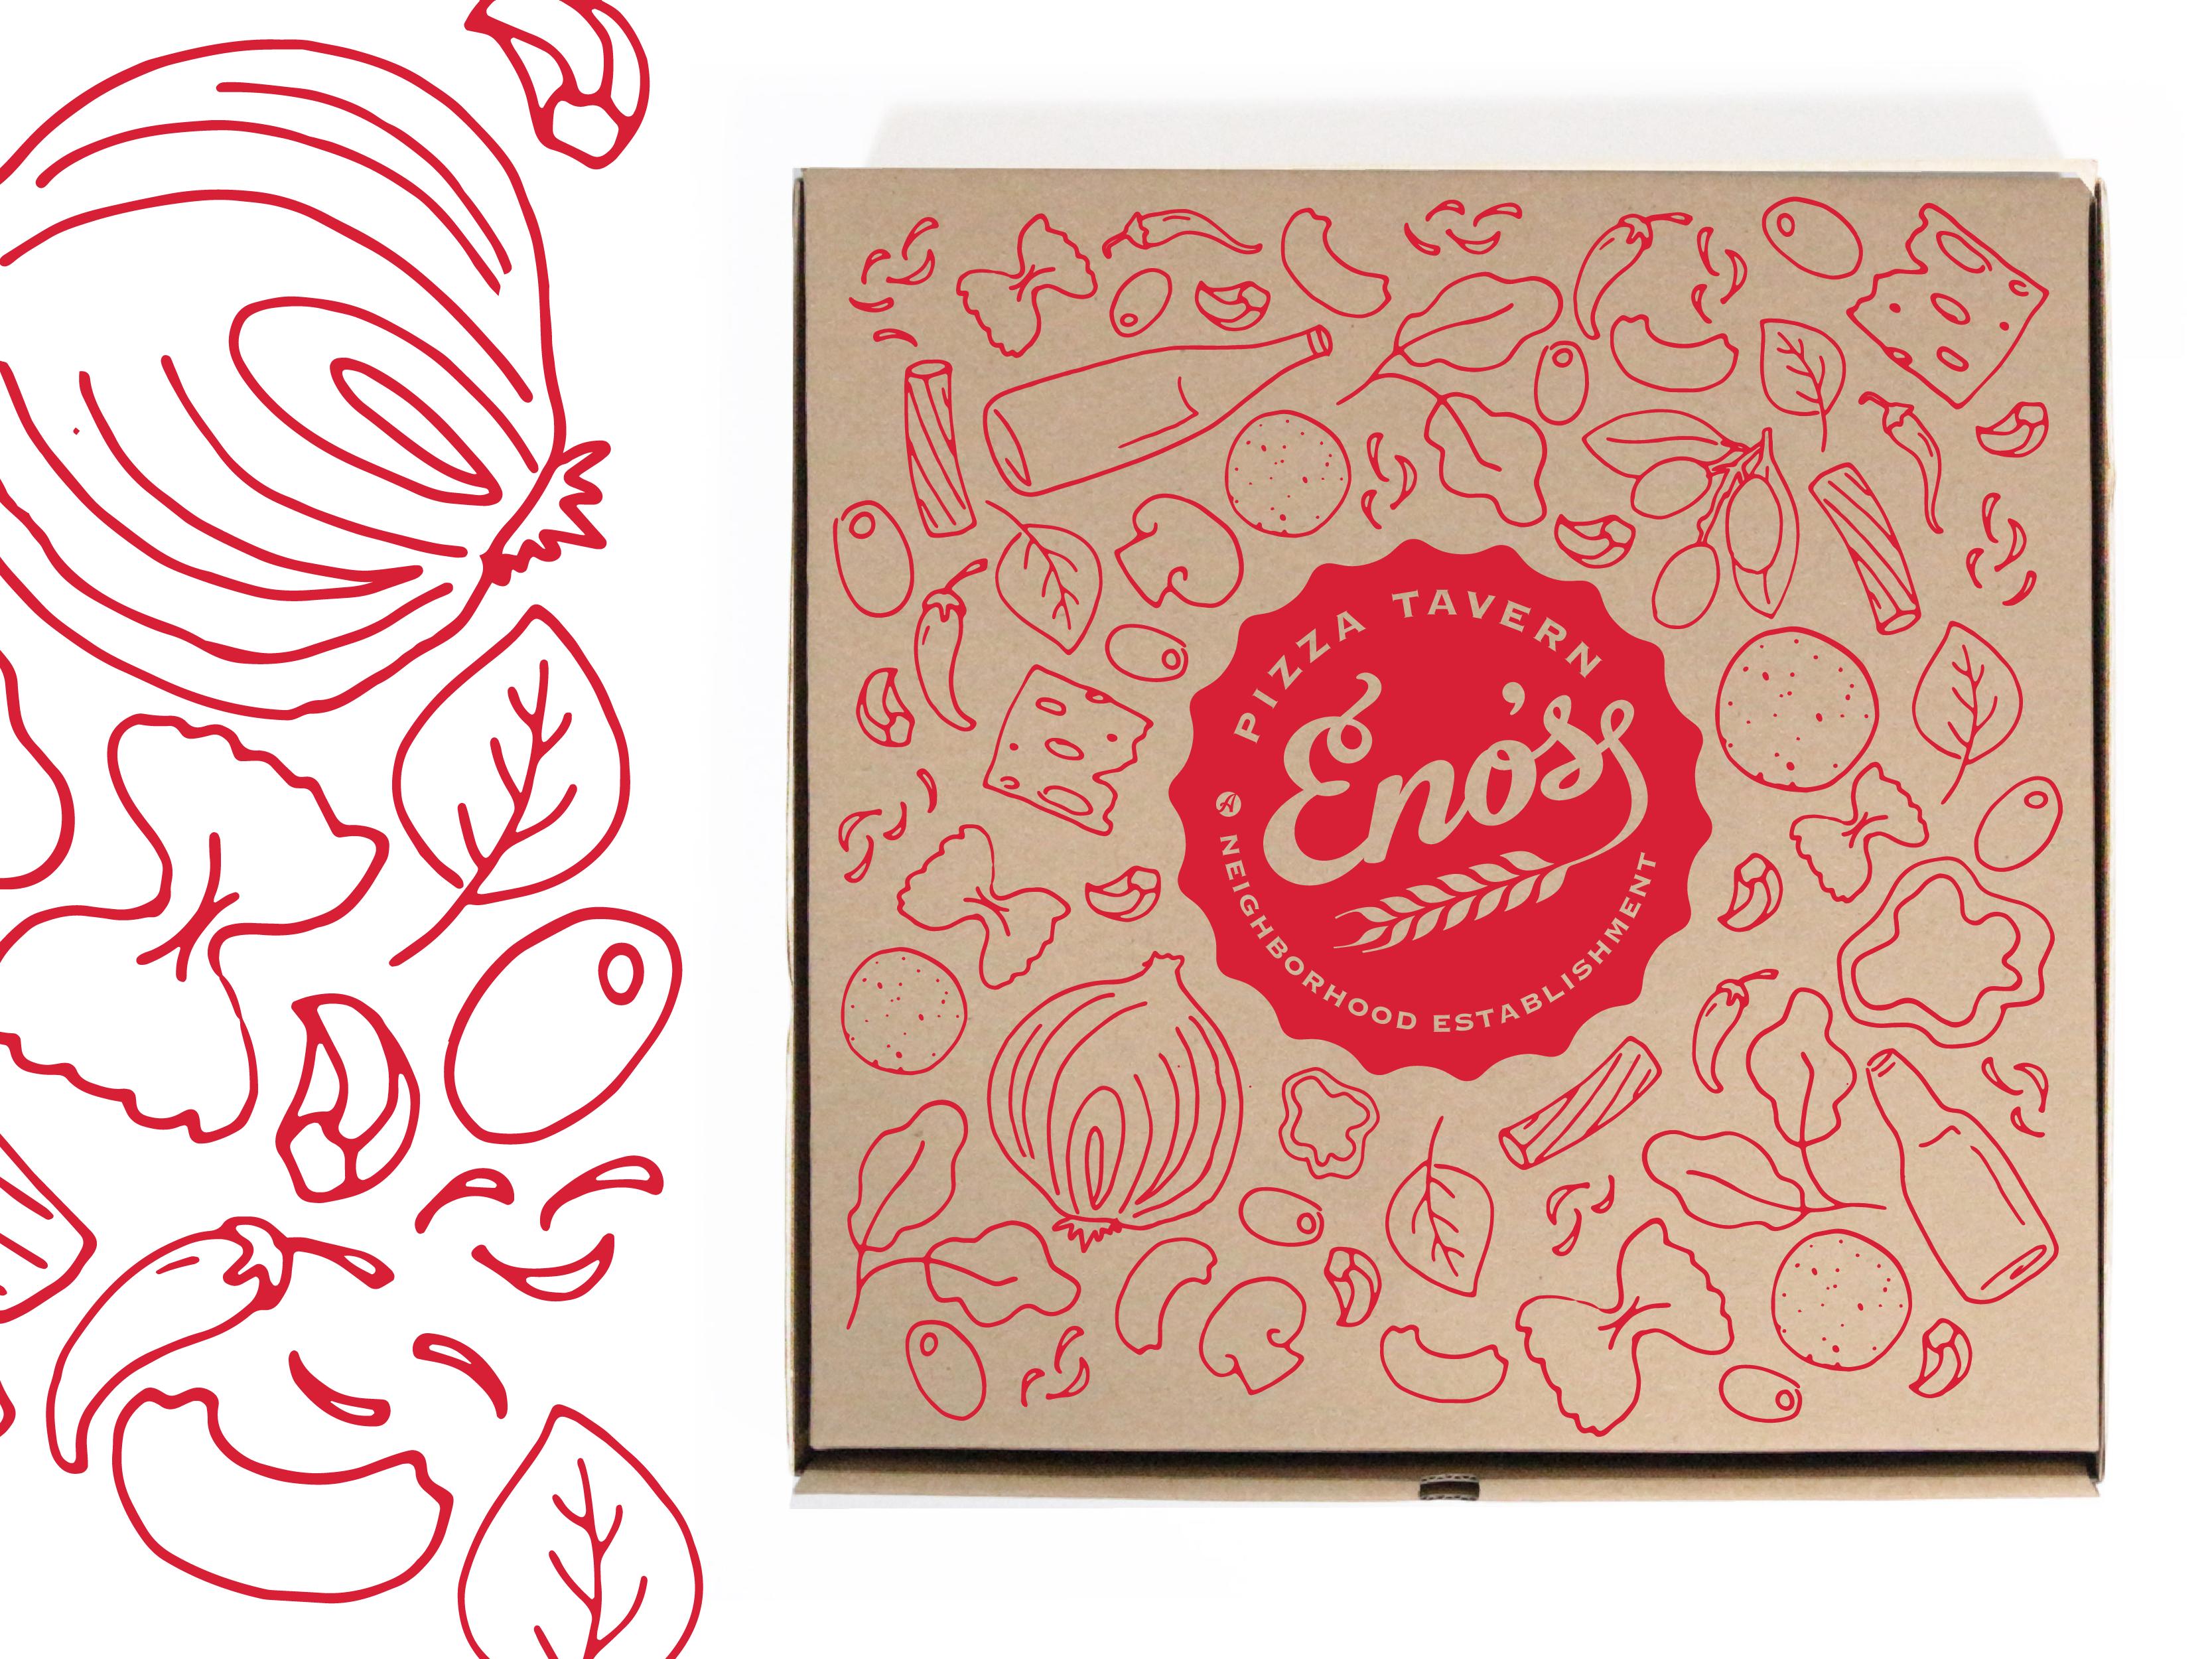 Eno S Pizza Box Design Pizza Box Design Pizza Boxes Box Design